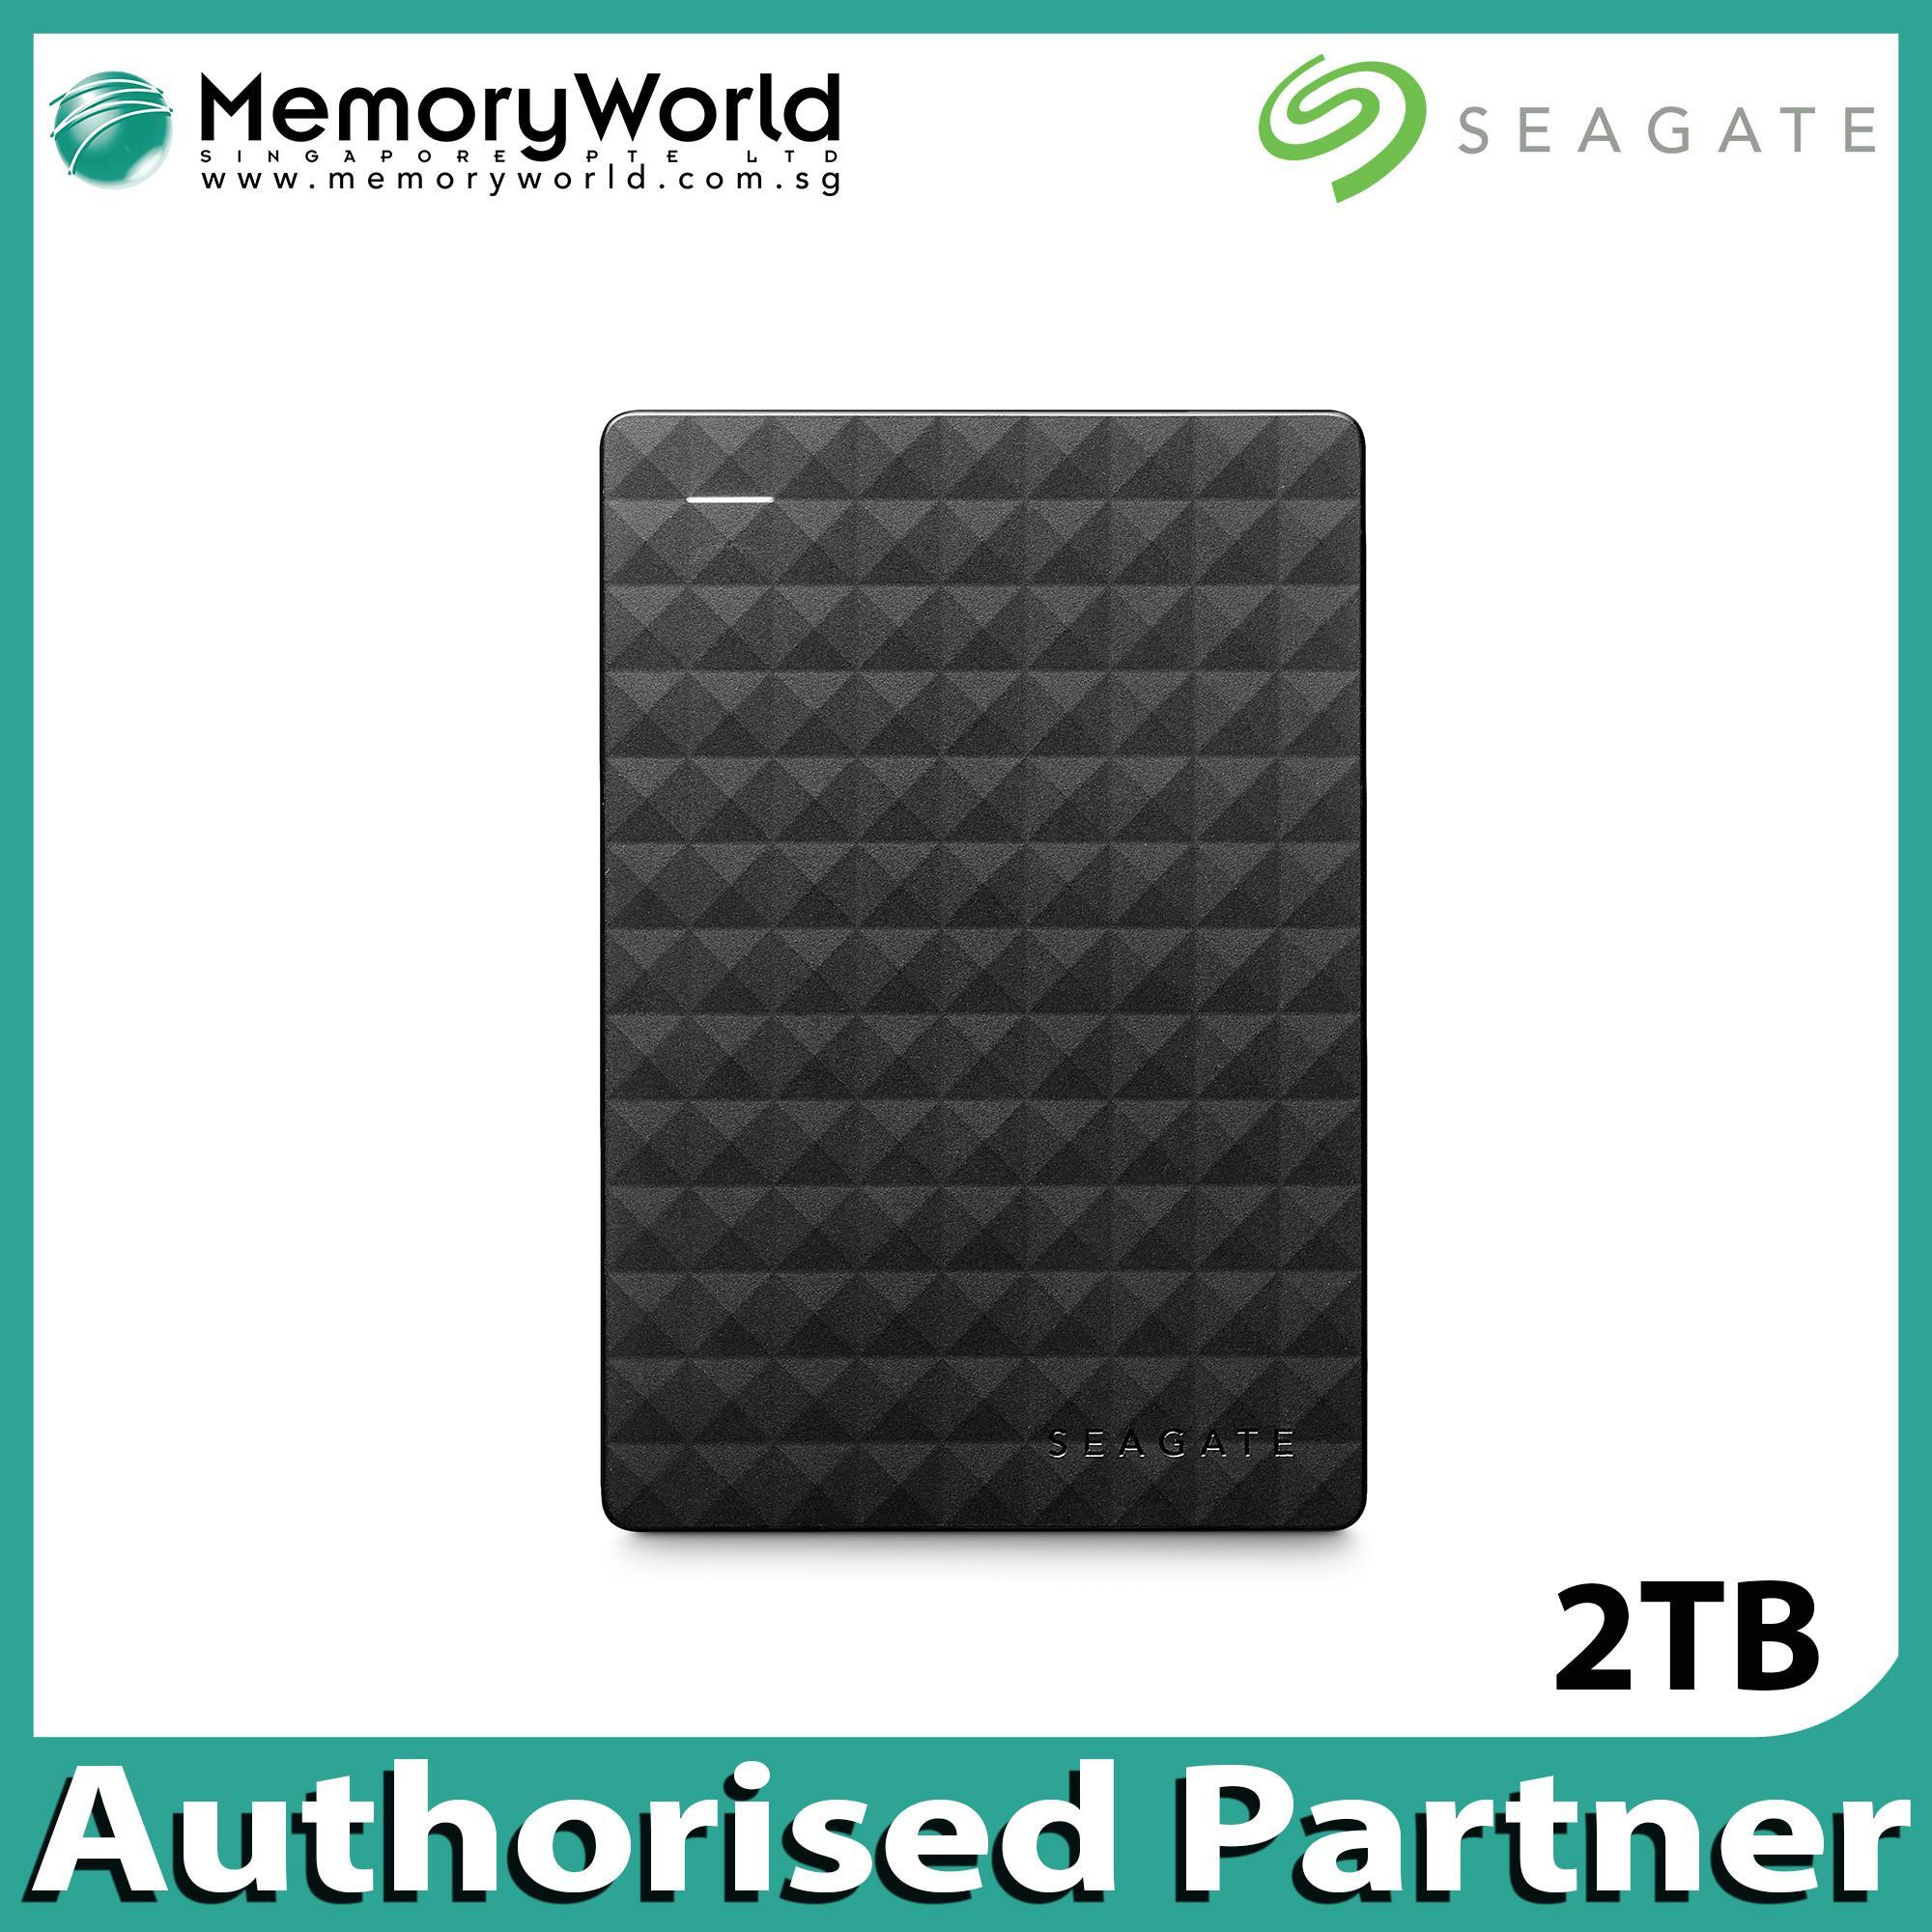 Jual Seagate Backup Plus Slim 4tb Hdd Hd Hardisk Harddisk External Toshiba Canvio Desk Eksternal 3tb 35ampquot Usb30 Putih Buy Sell Cheapest 2tb Portable Best Quality Product Deals